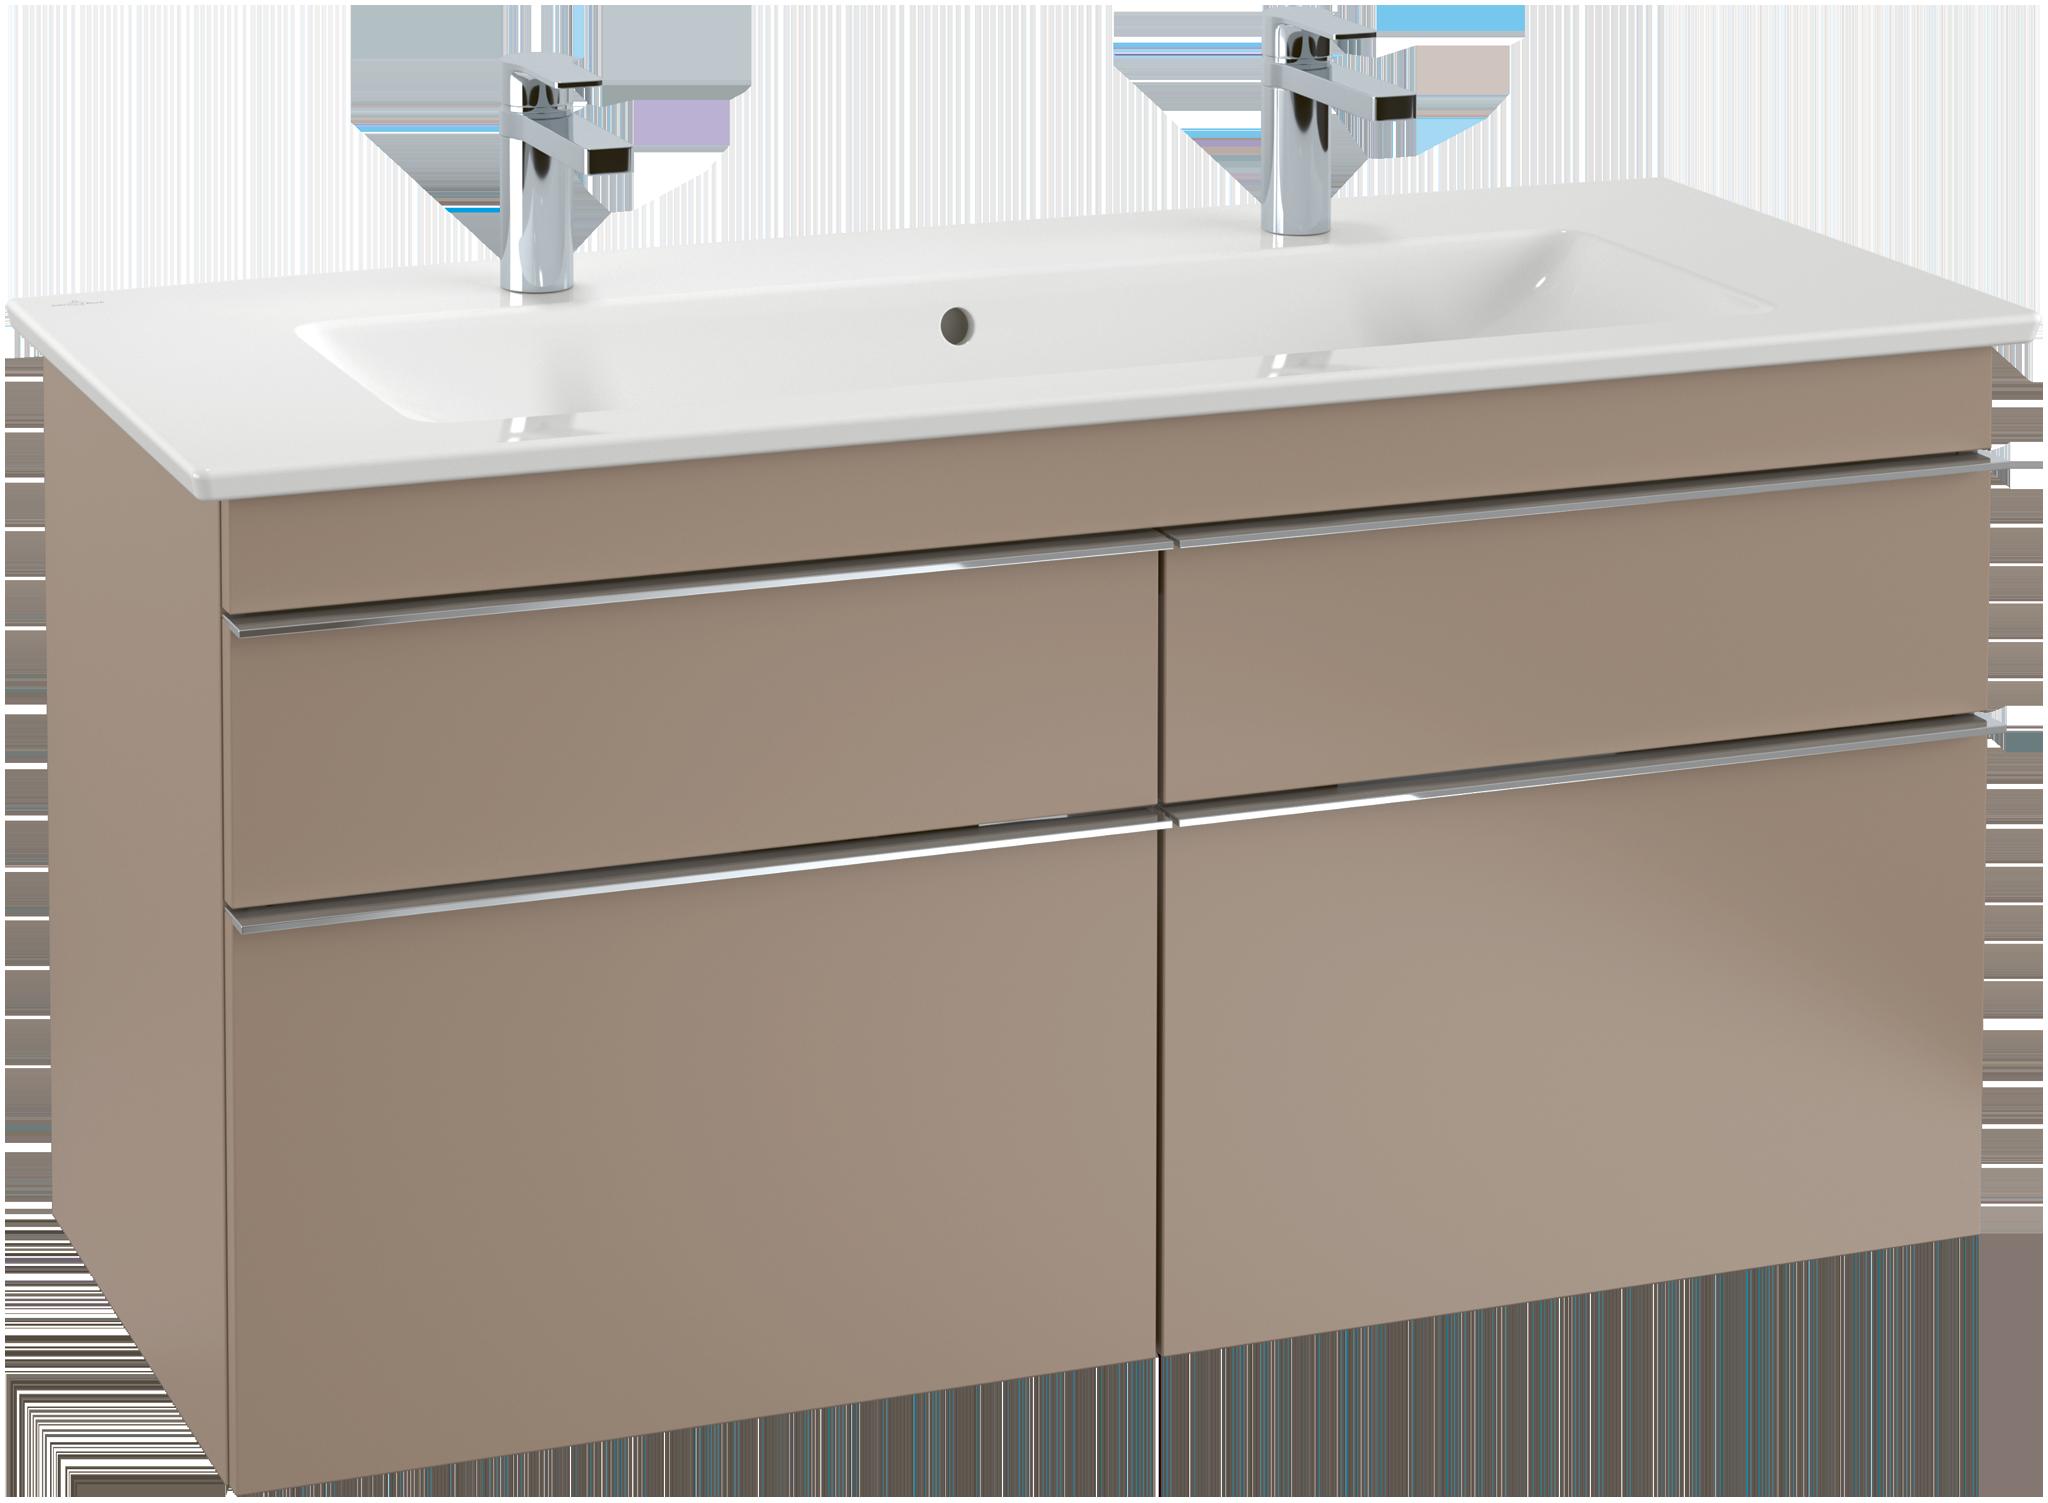 venticello szafka podumywalkowa a92903 villeroy boch. Black Bedroom Furniture Sets. Home Design Ideas